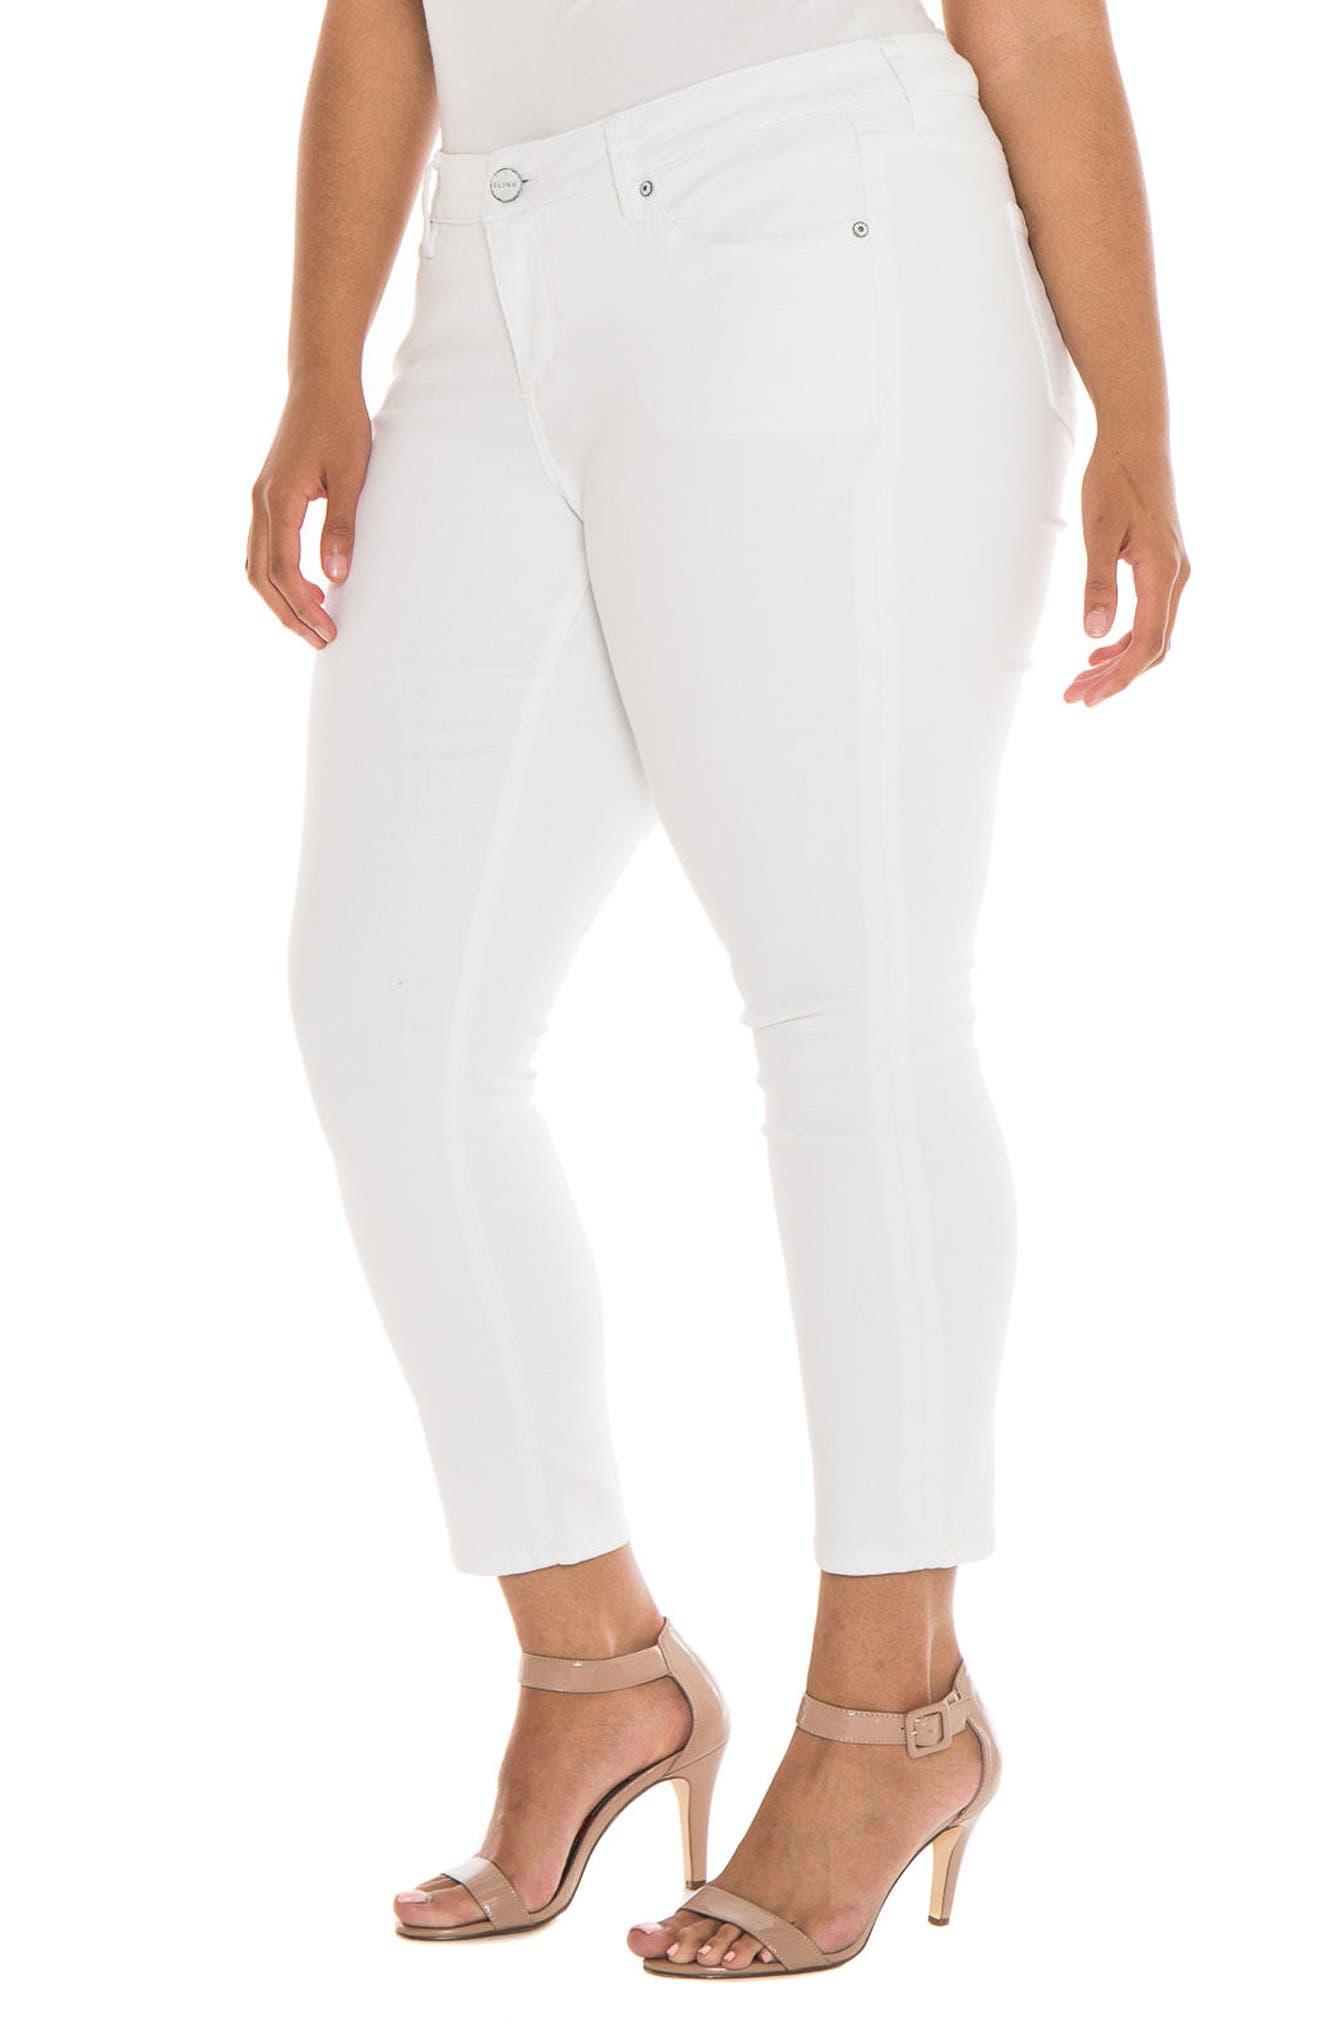 Alternate Image 1 Selected - SLINK Jeans Stretch Skinny Jeans (Charlie) (Plus Size)